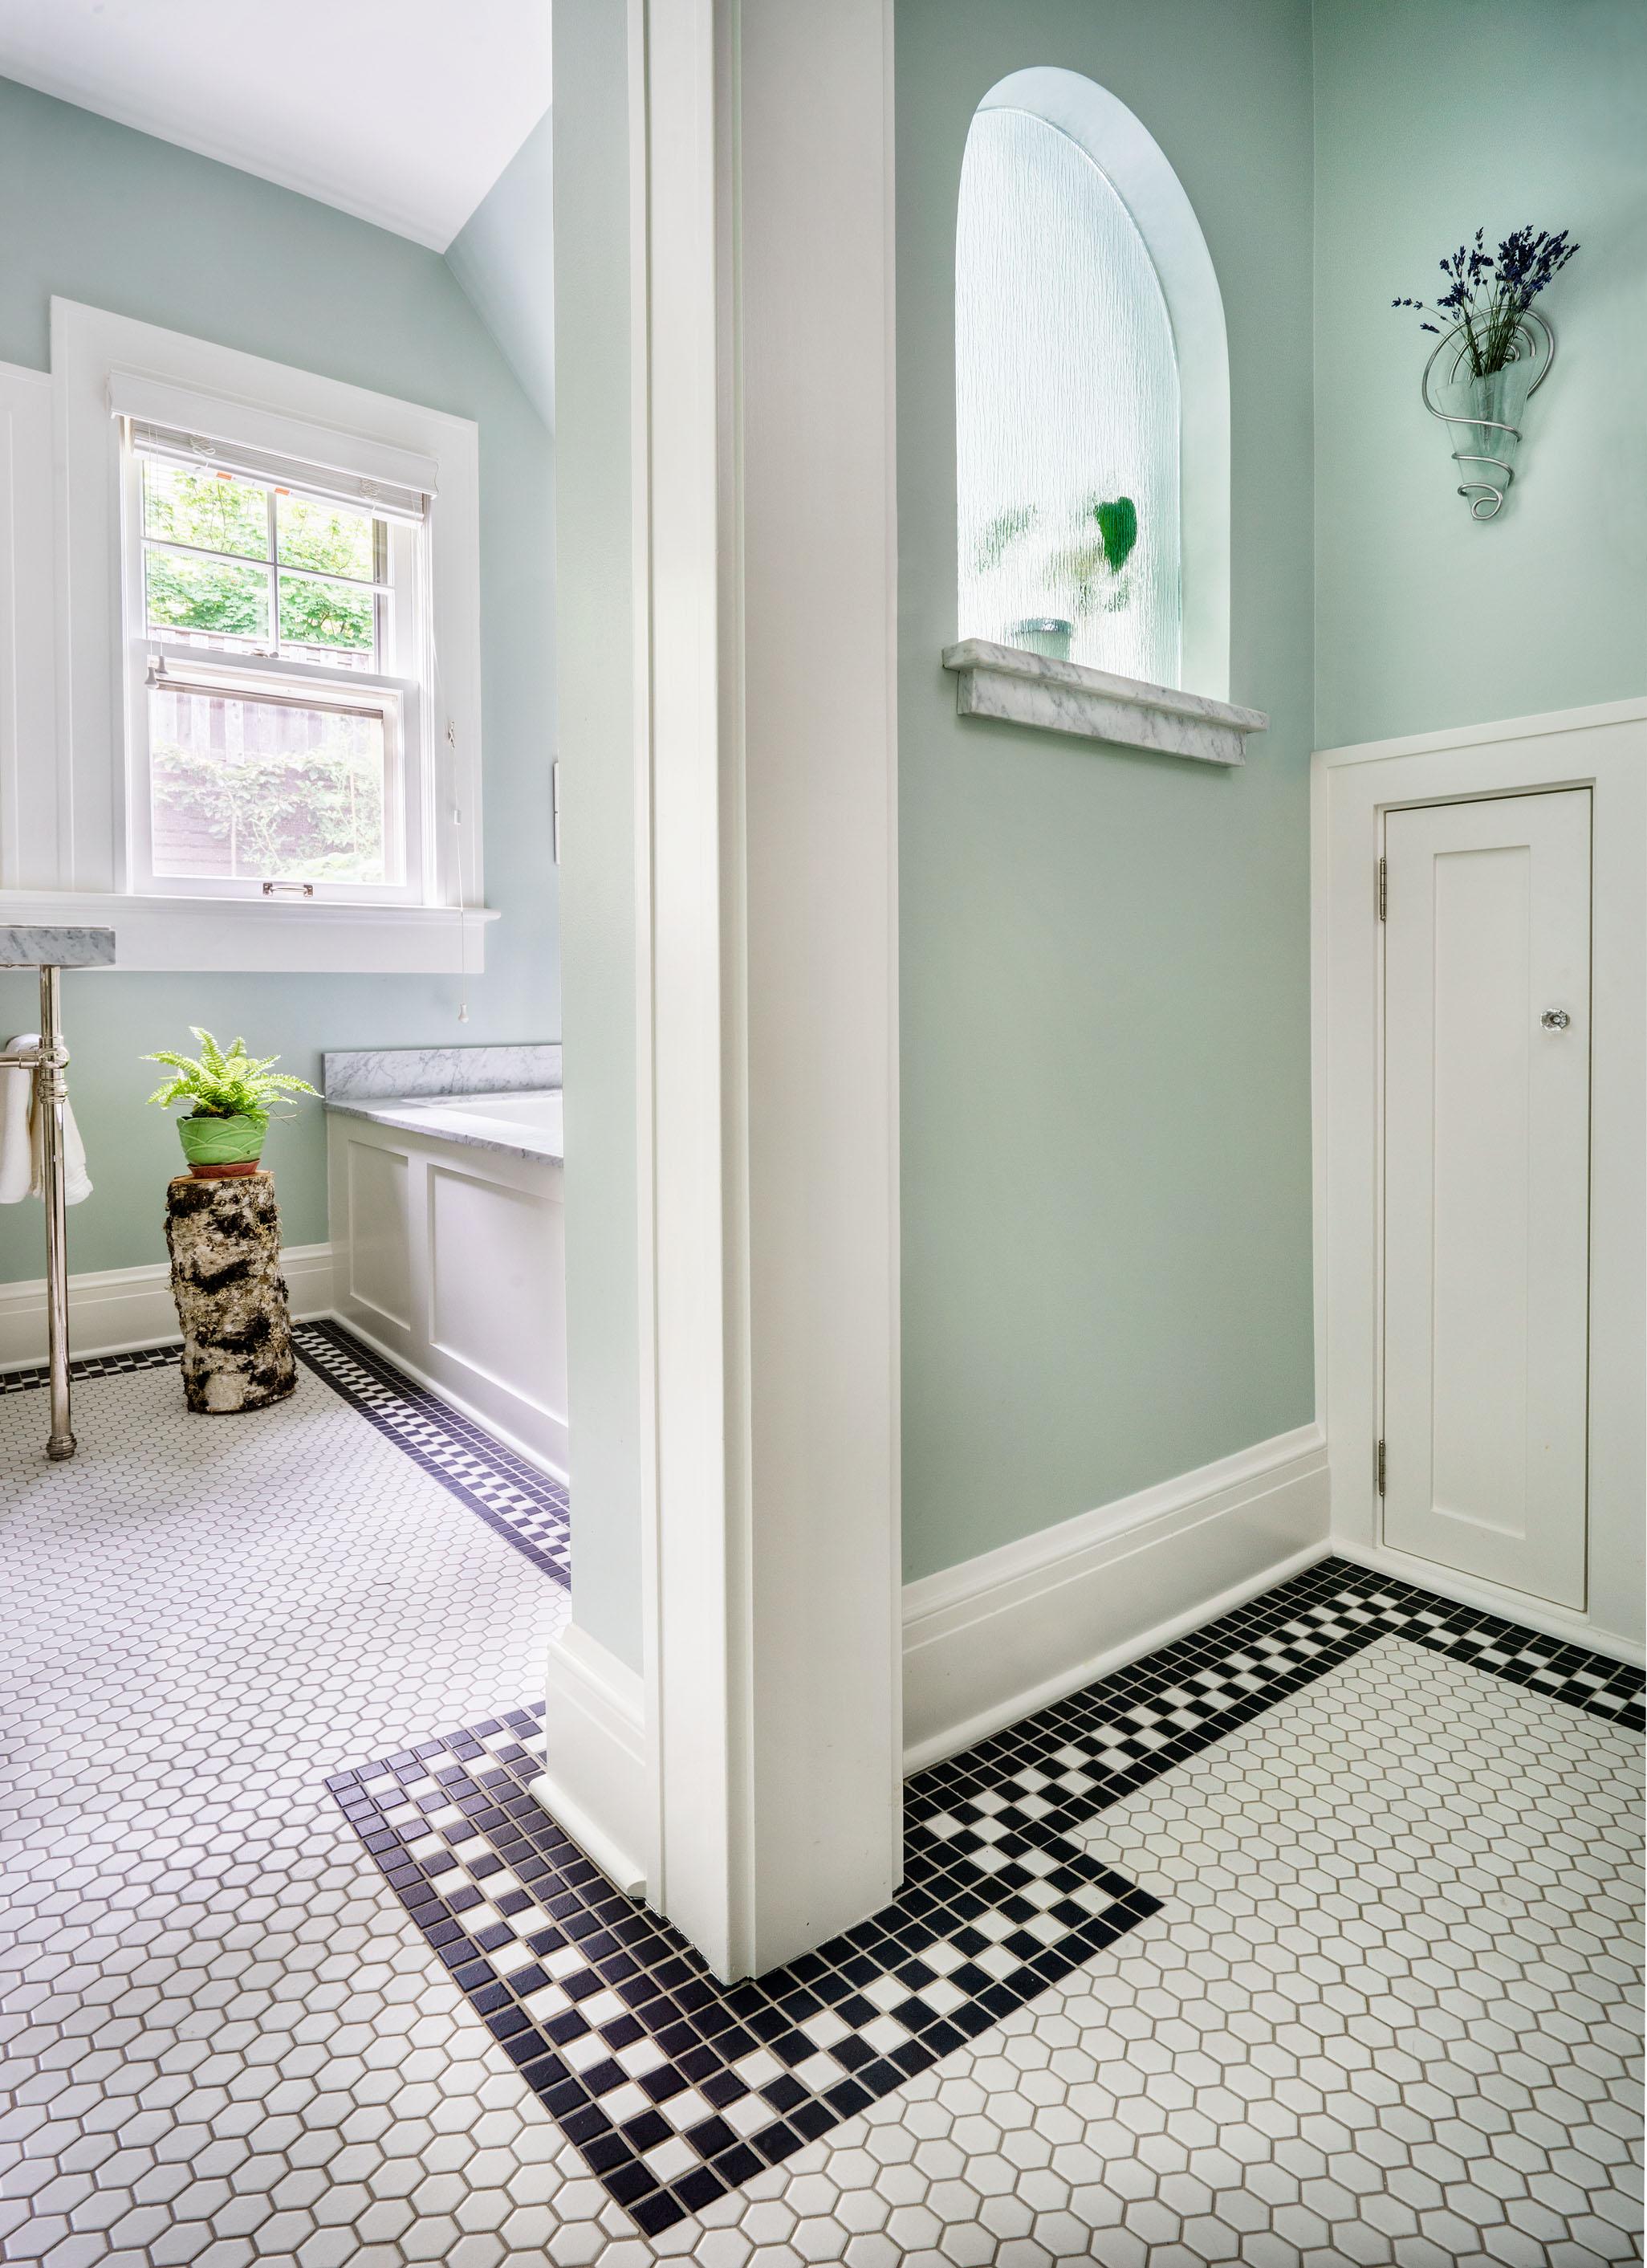 Vintage tile flooring and trim.